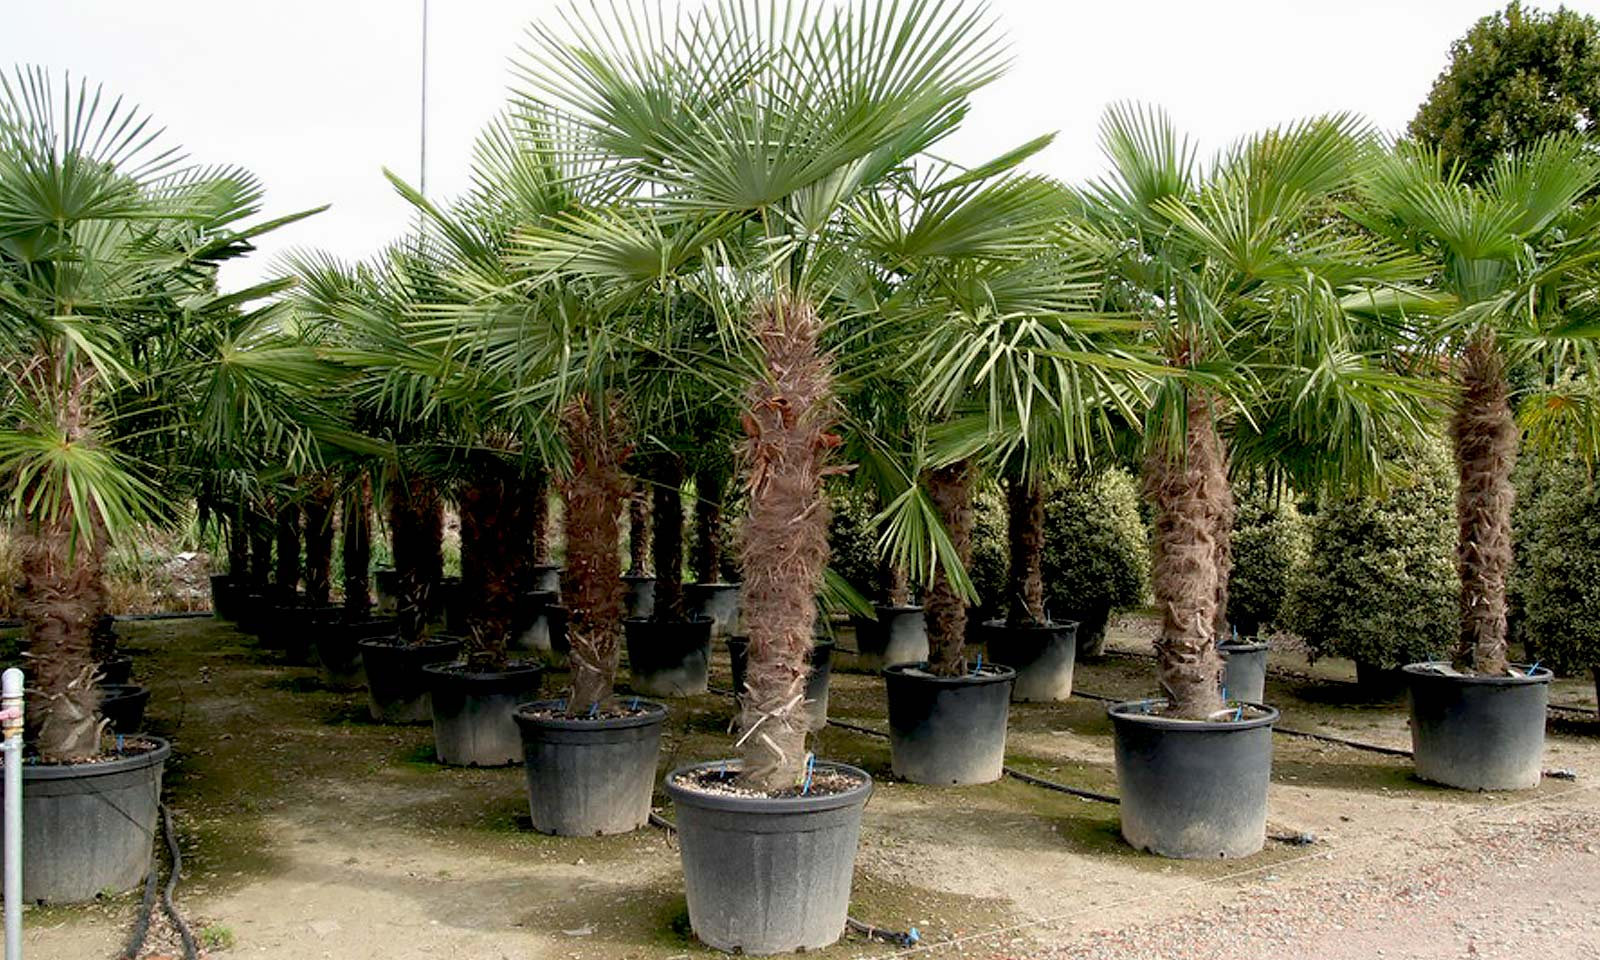 Chamaerops Excelsa / Trachycarpus Fortunei (Chusan Palm)